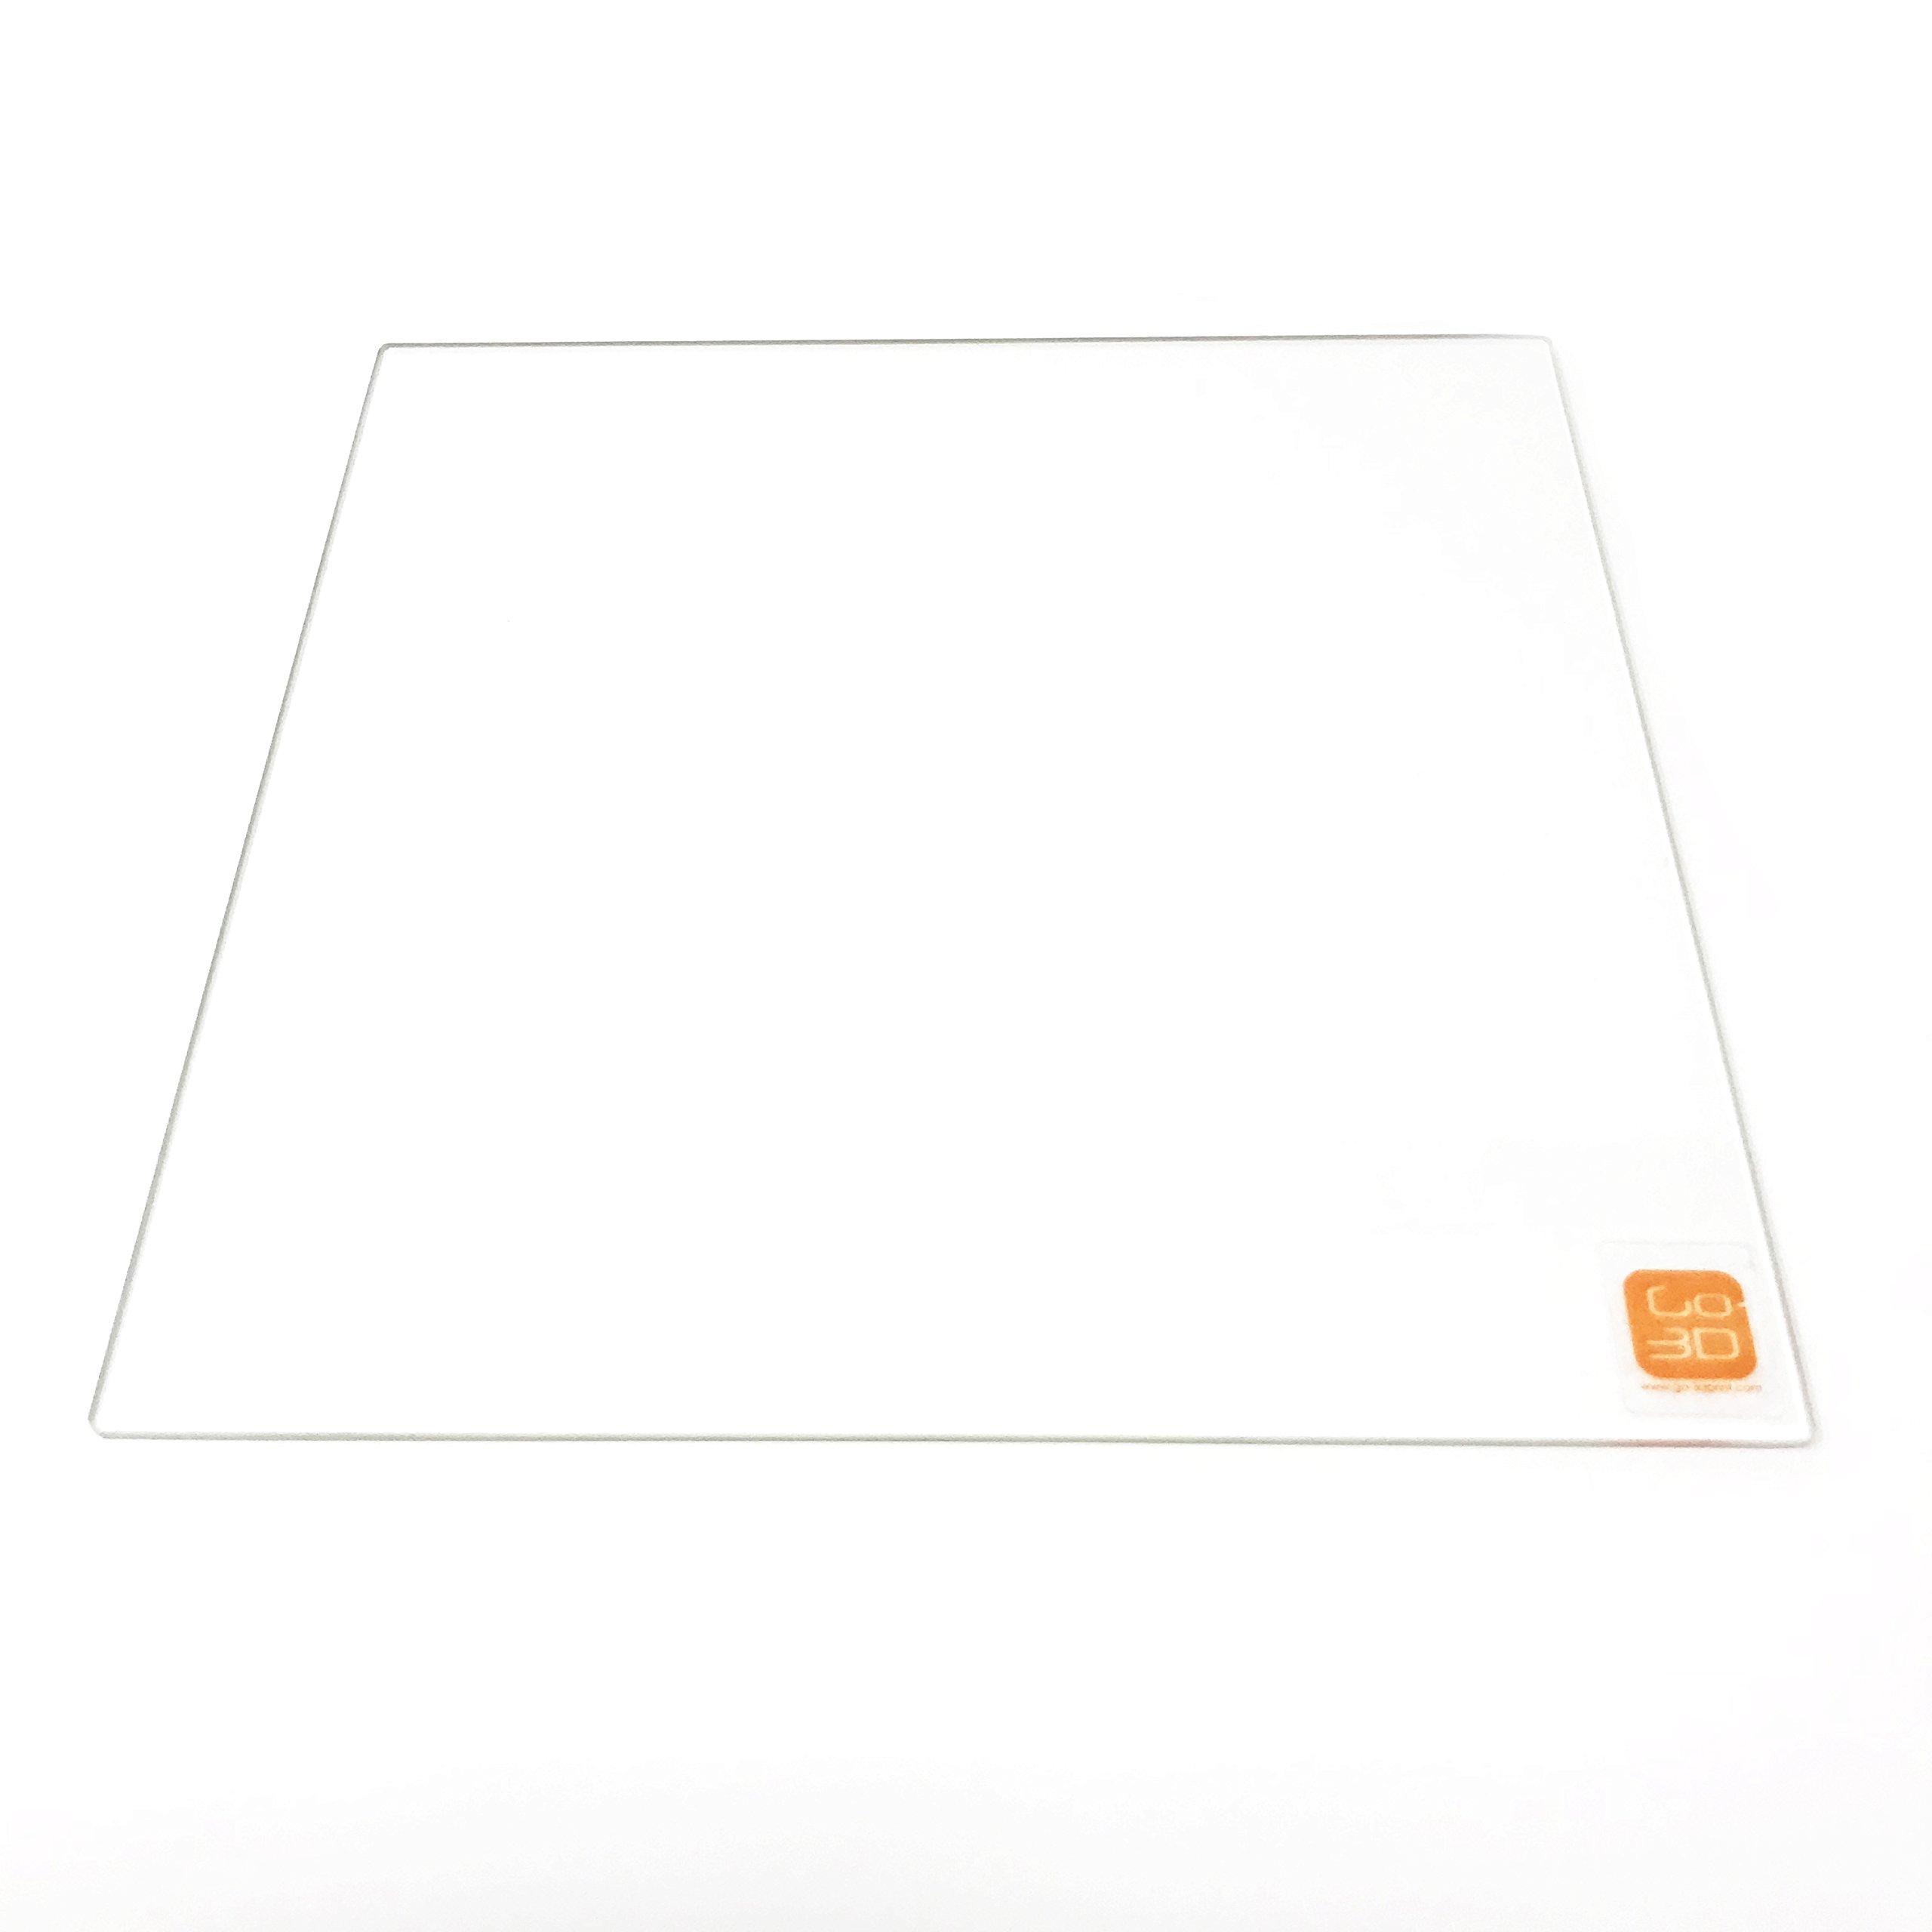 GO-3D PRINT 220mm x 220mm Borosilicate Glass